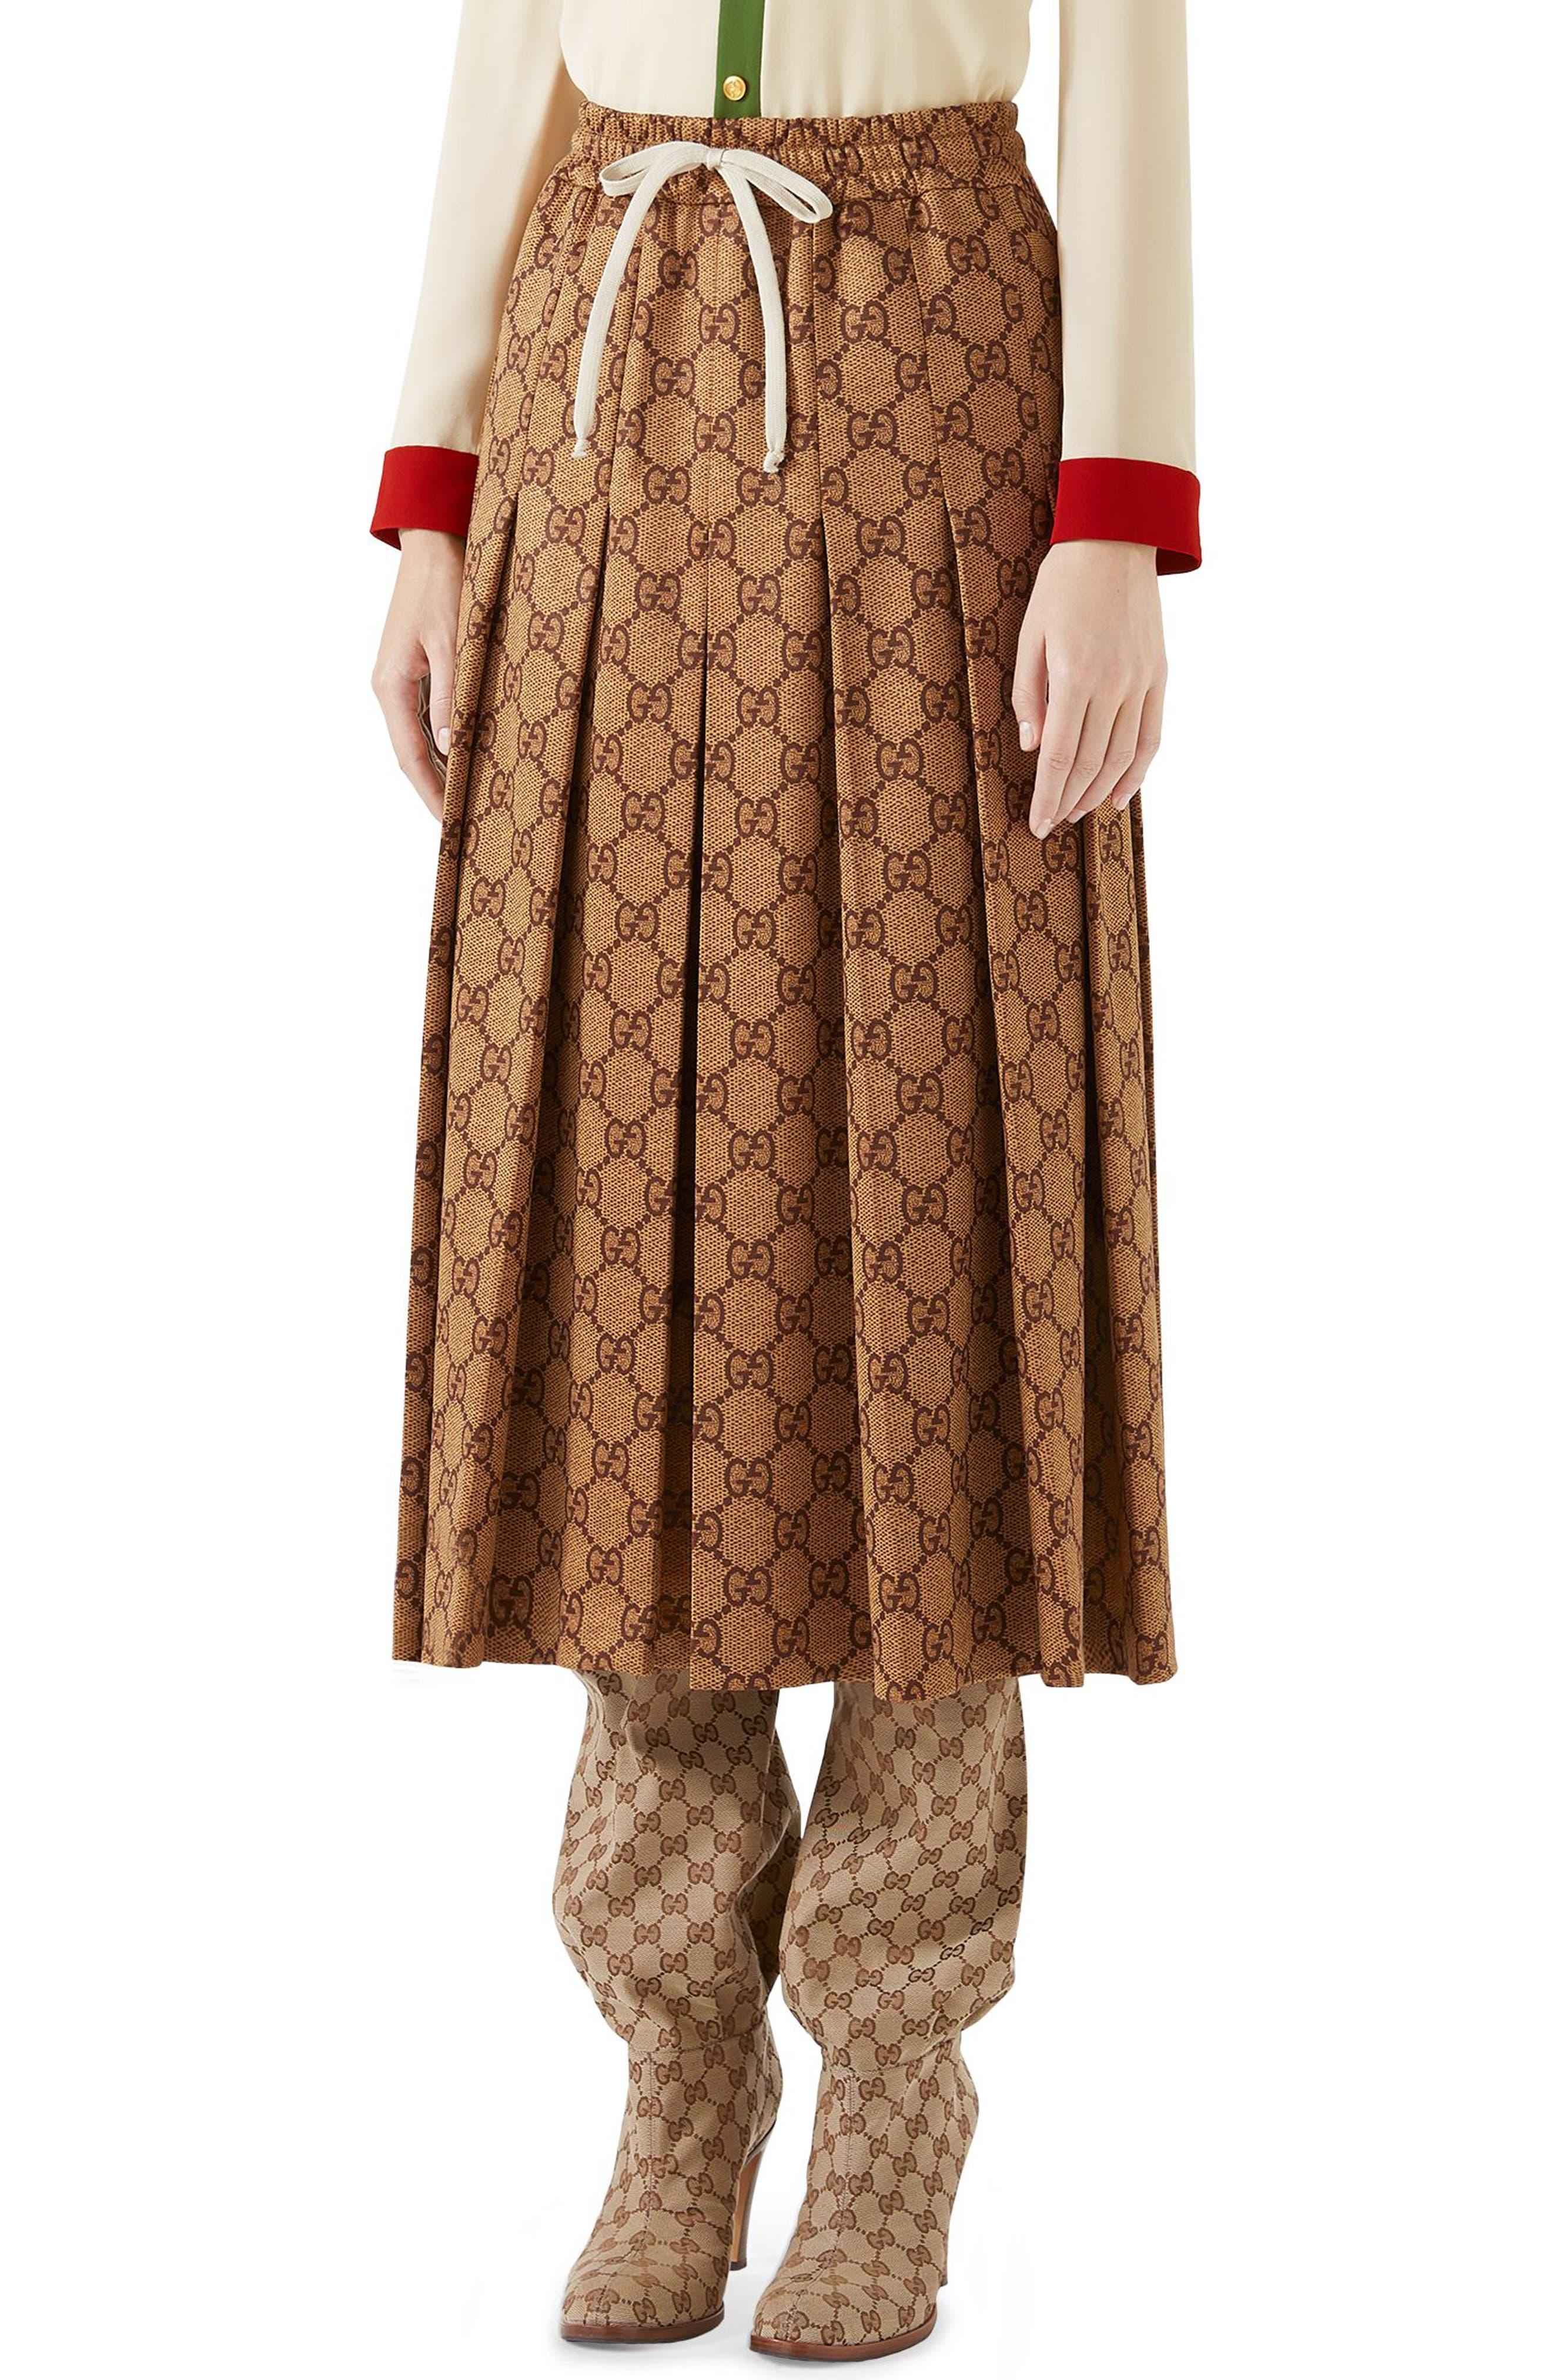 GG Print Pleated Midi Skirt,                             Main thumbnail 1, color,                             VINTAGE CAMEL